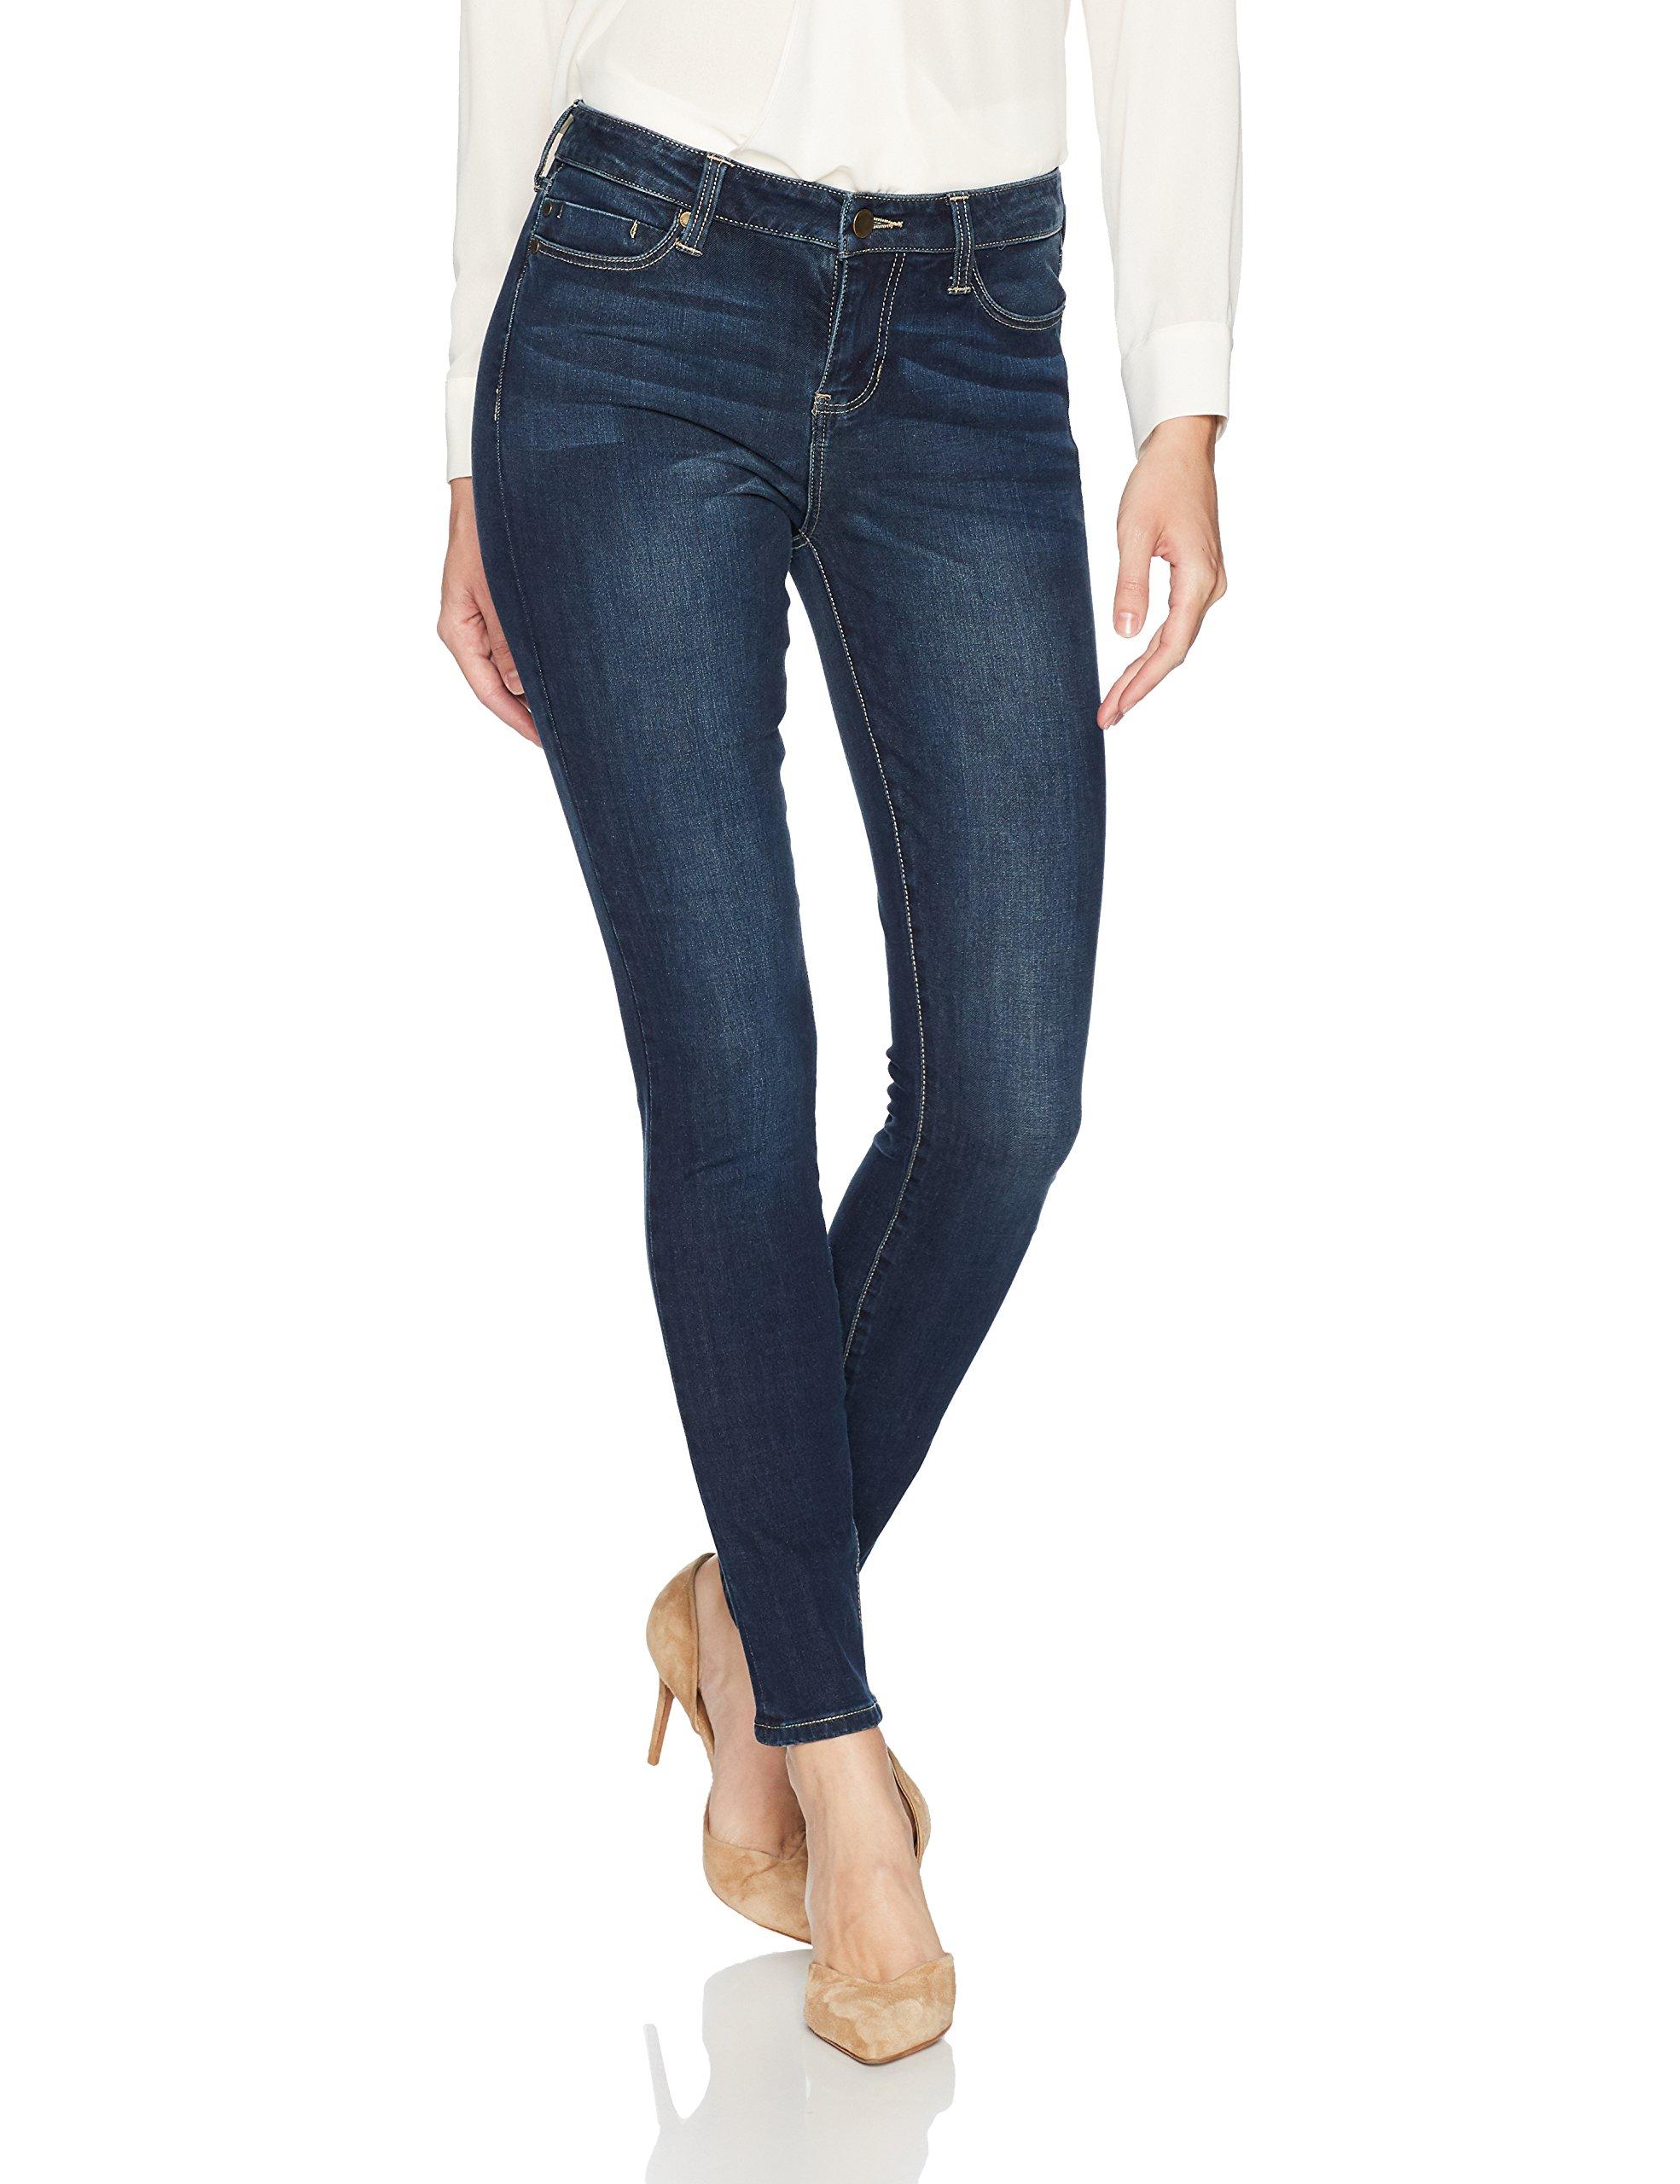 Jeans 30 Abby W Jean Liverpool SkinnyBluelynx L F1432 Femme qUzMpSVG